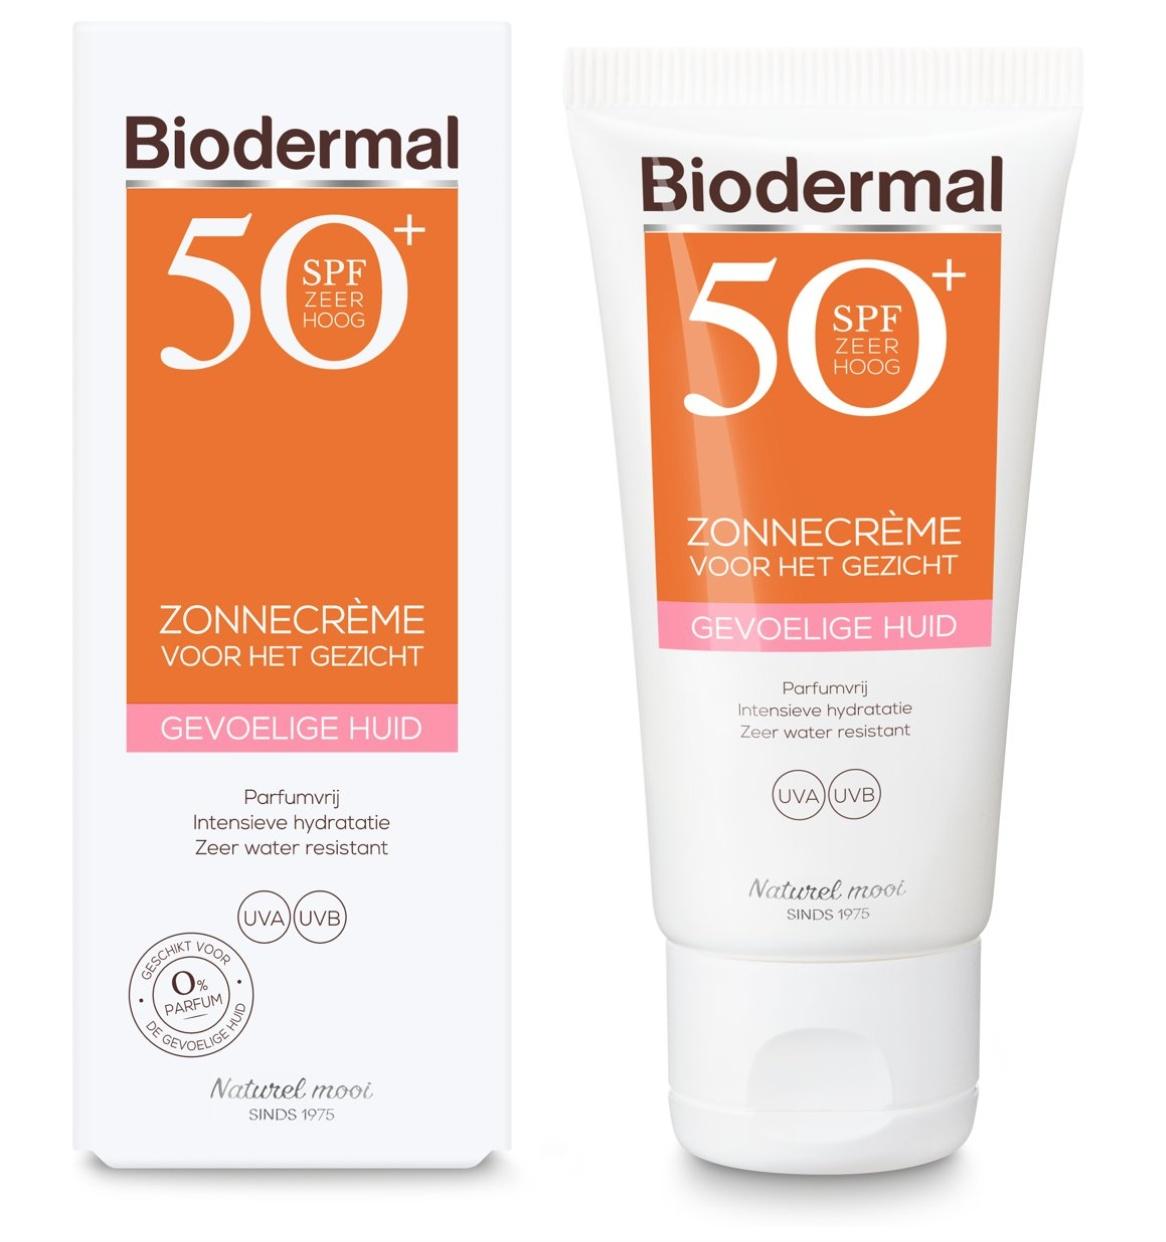 Biodermal Sensitive Spf 50+